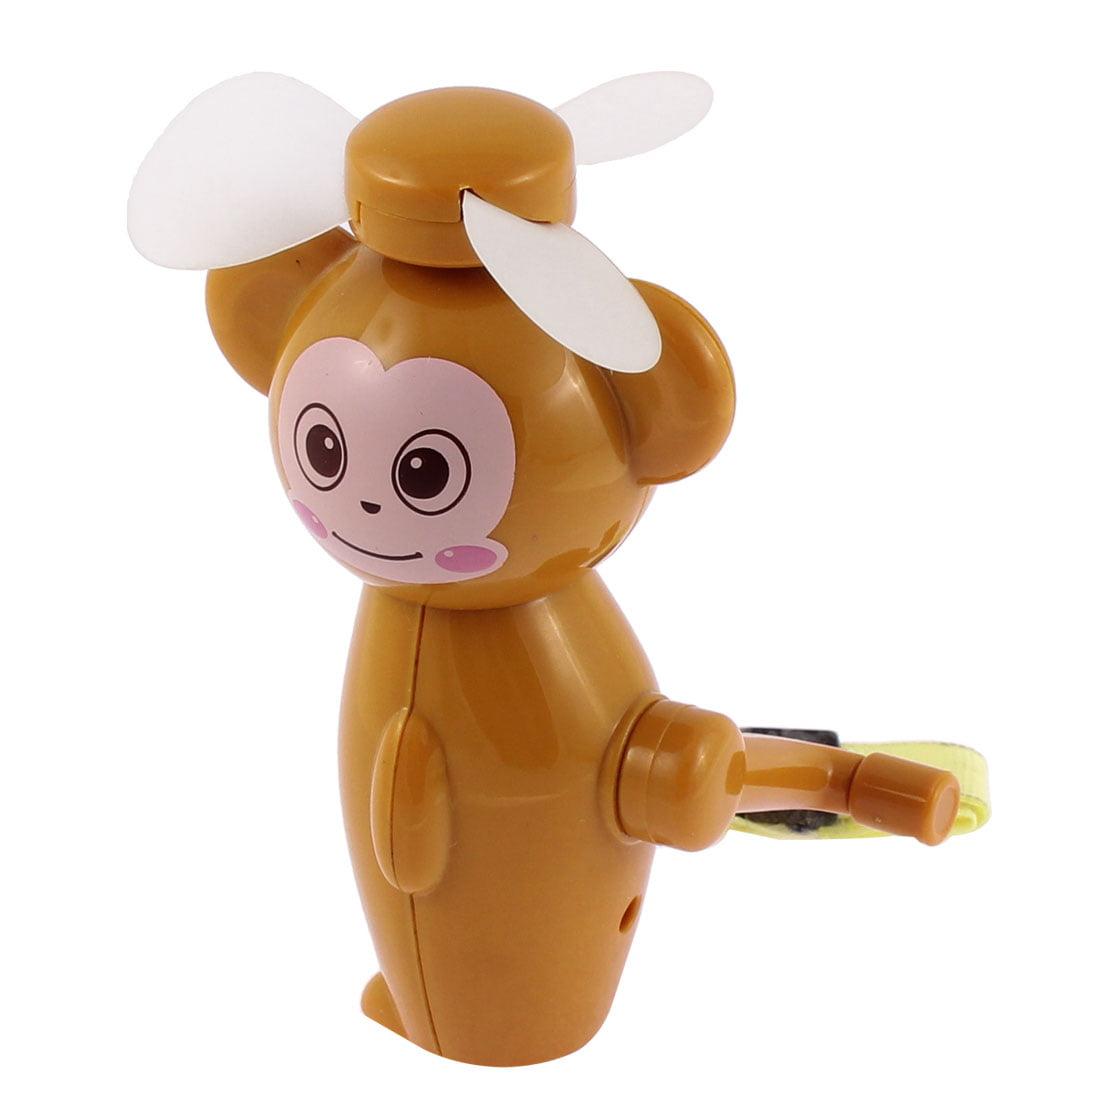 Handheld Plastic Monkey Design Hand Crank Mini Cooling Fan Cooler Brown